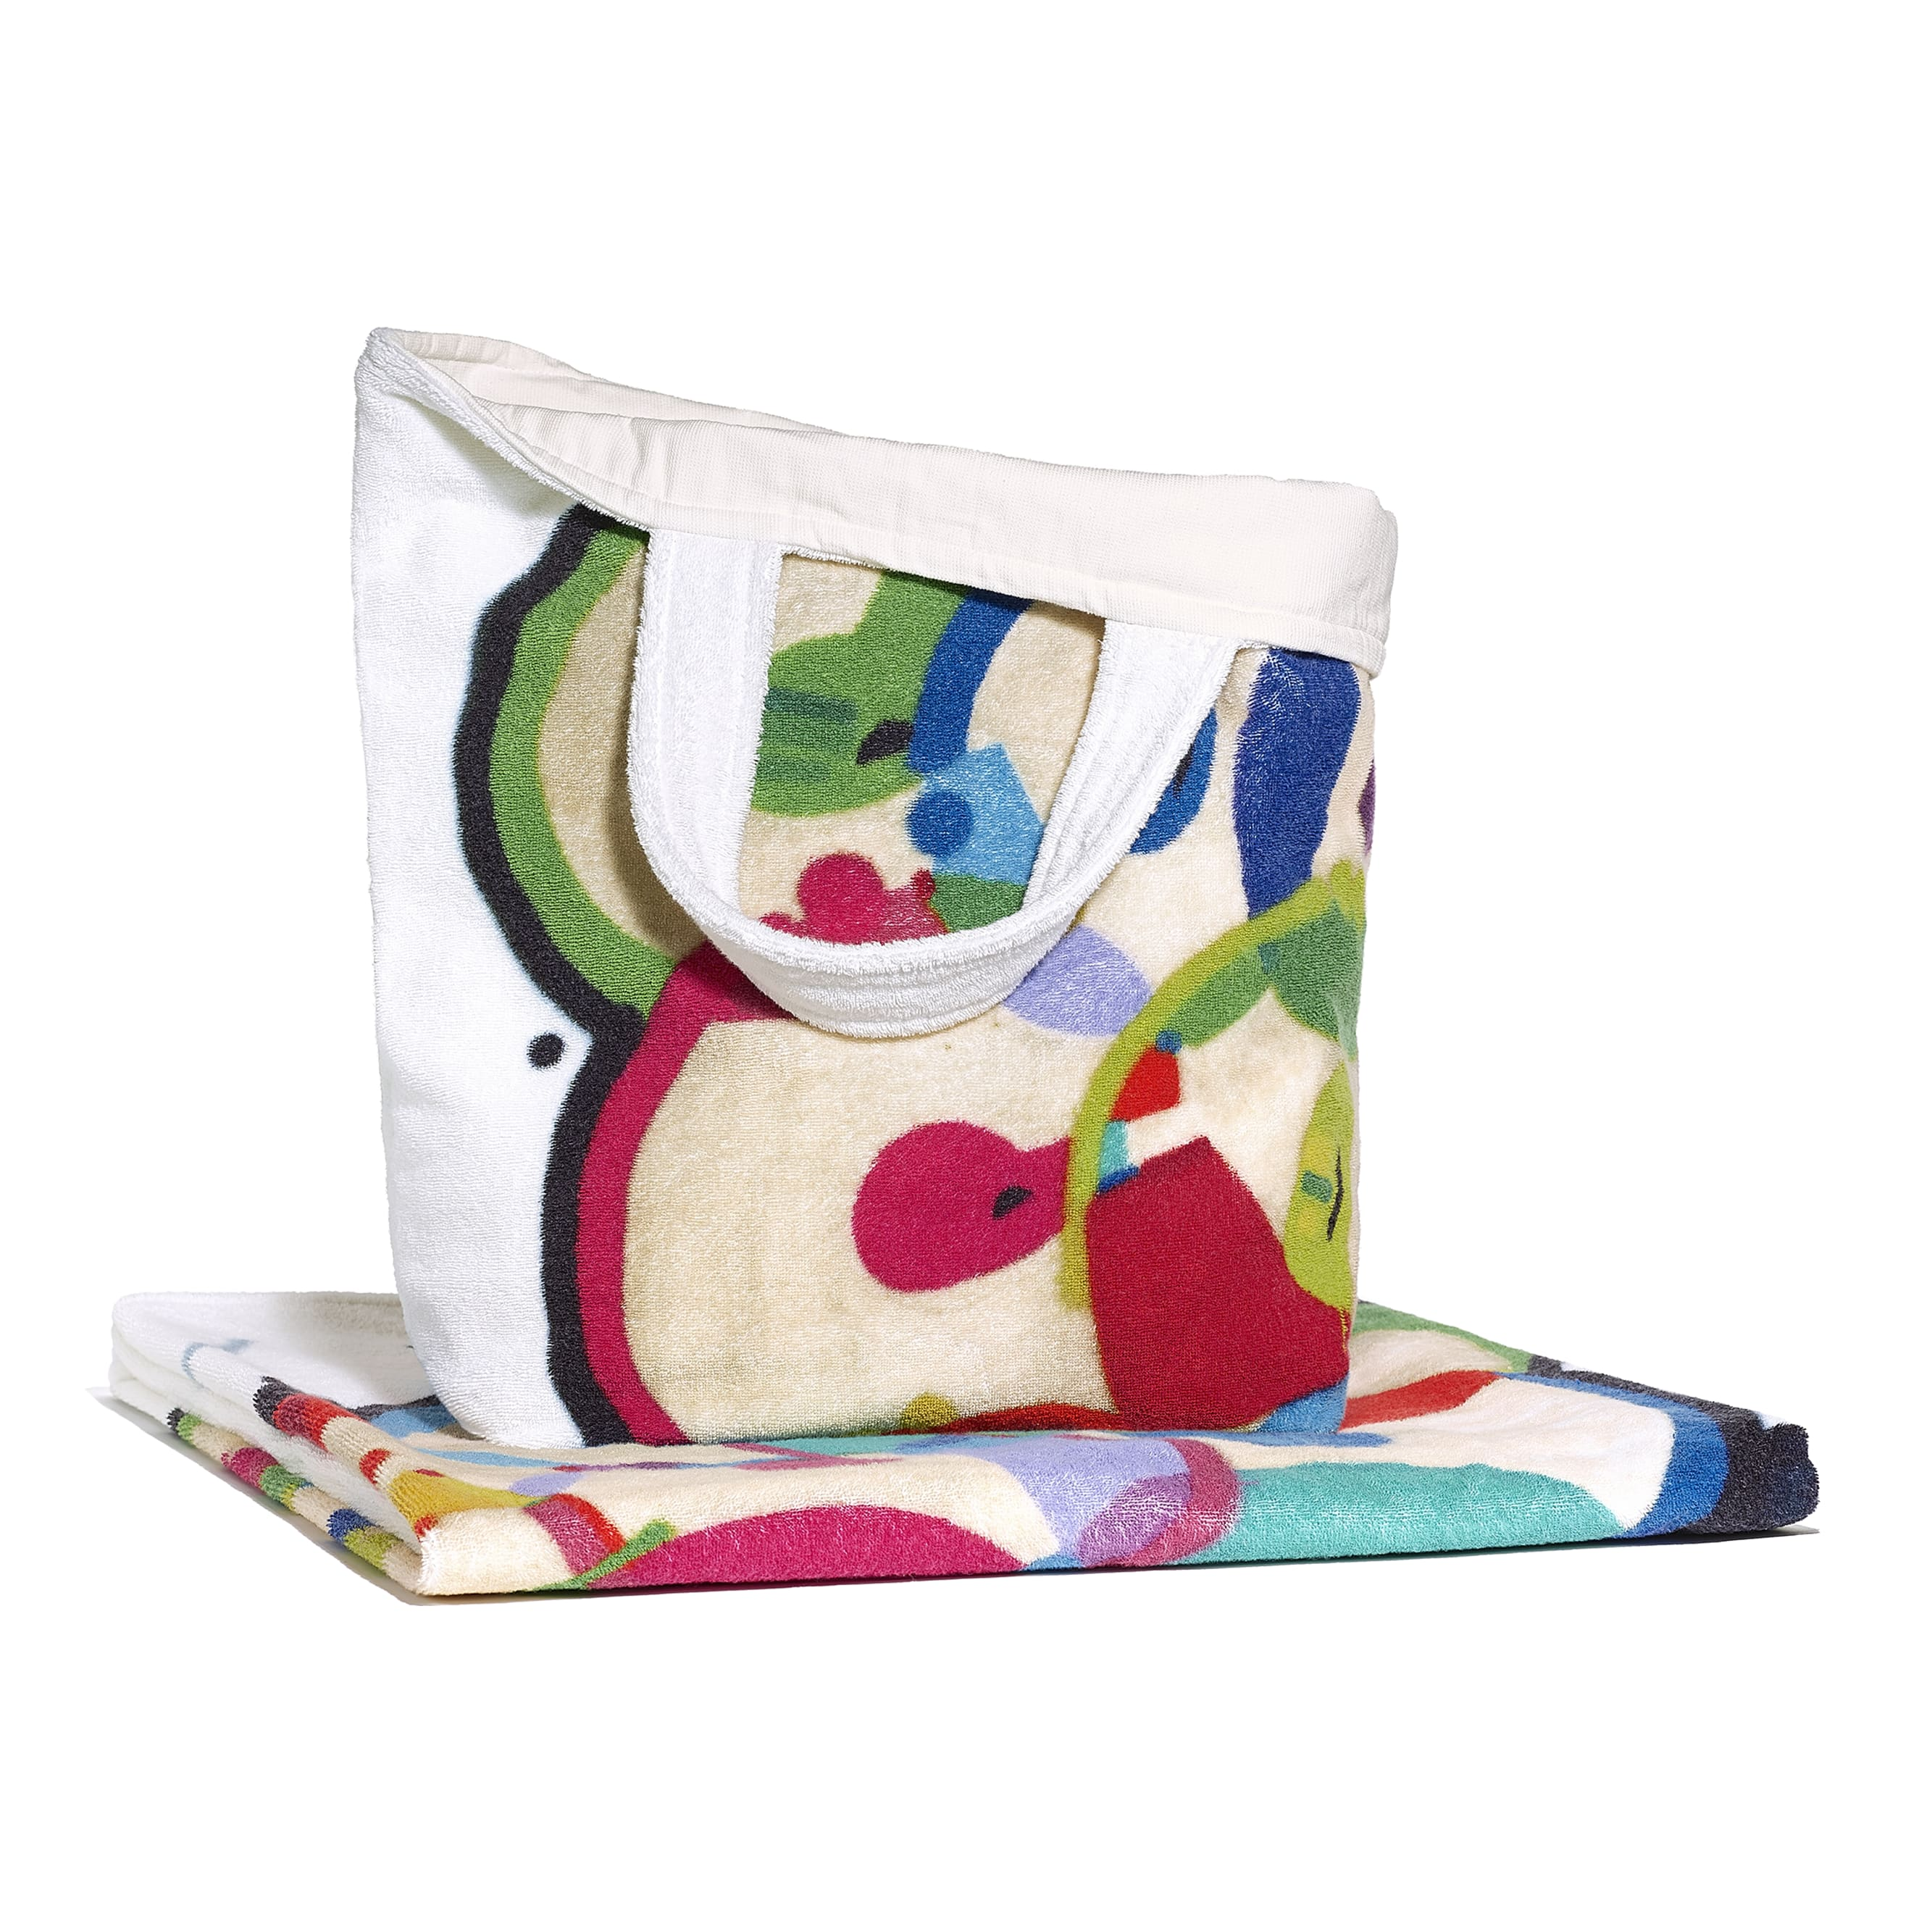 Beachwear Set - Ivory & Multicolour - Cotton - Alternative view - see standard sized version